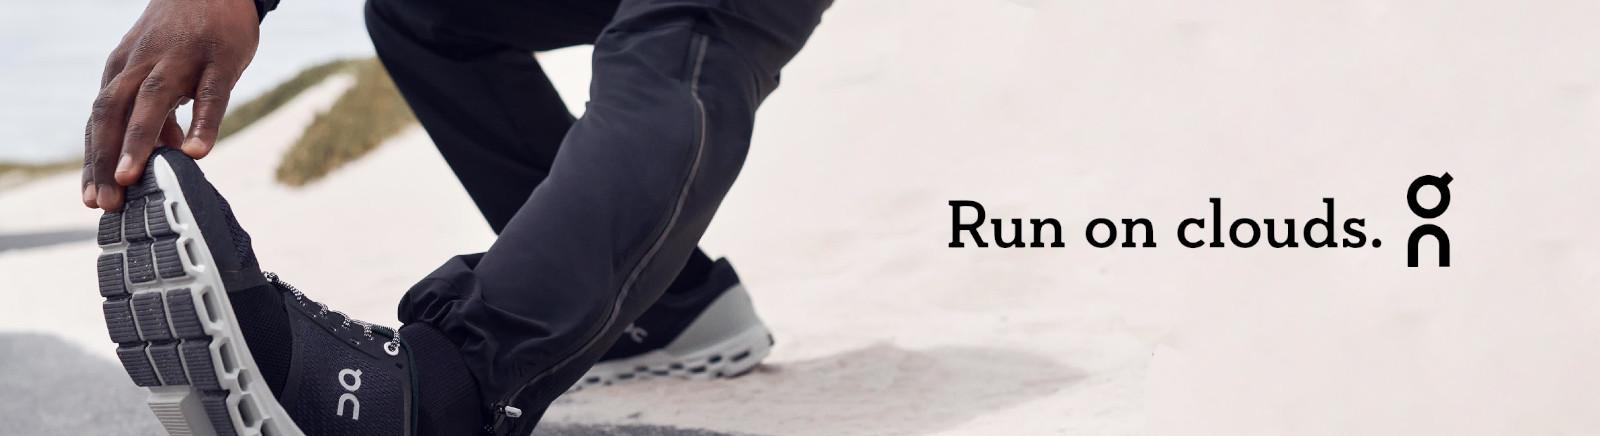 On Running Herrenschuhe online bestellen im Juppen Shop